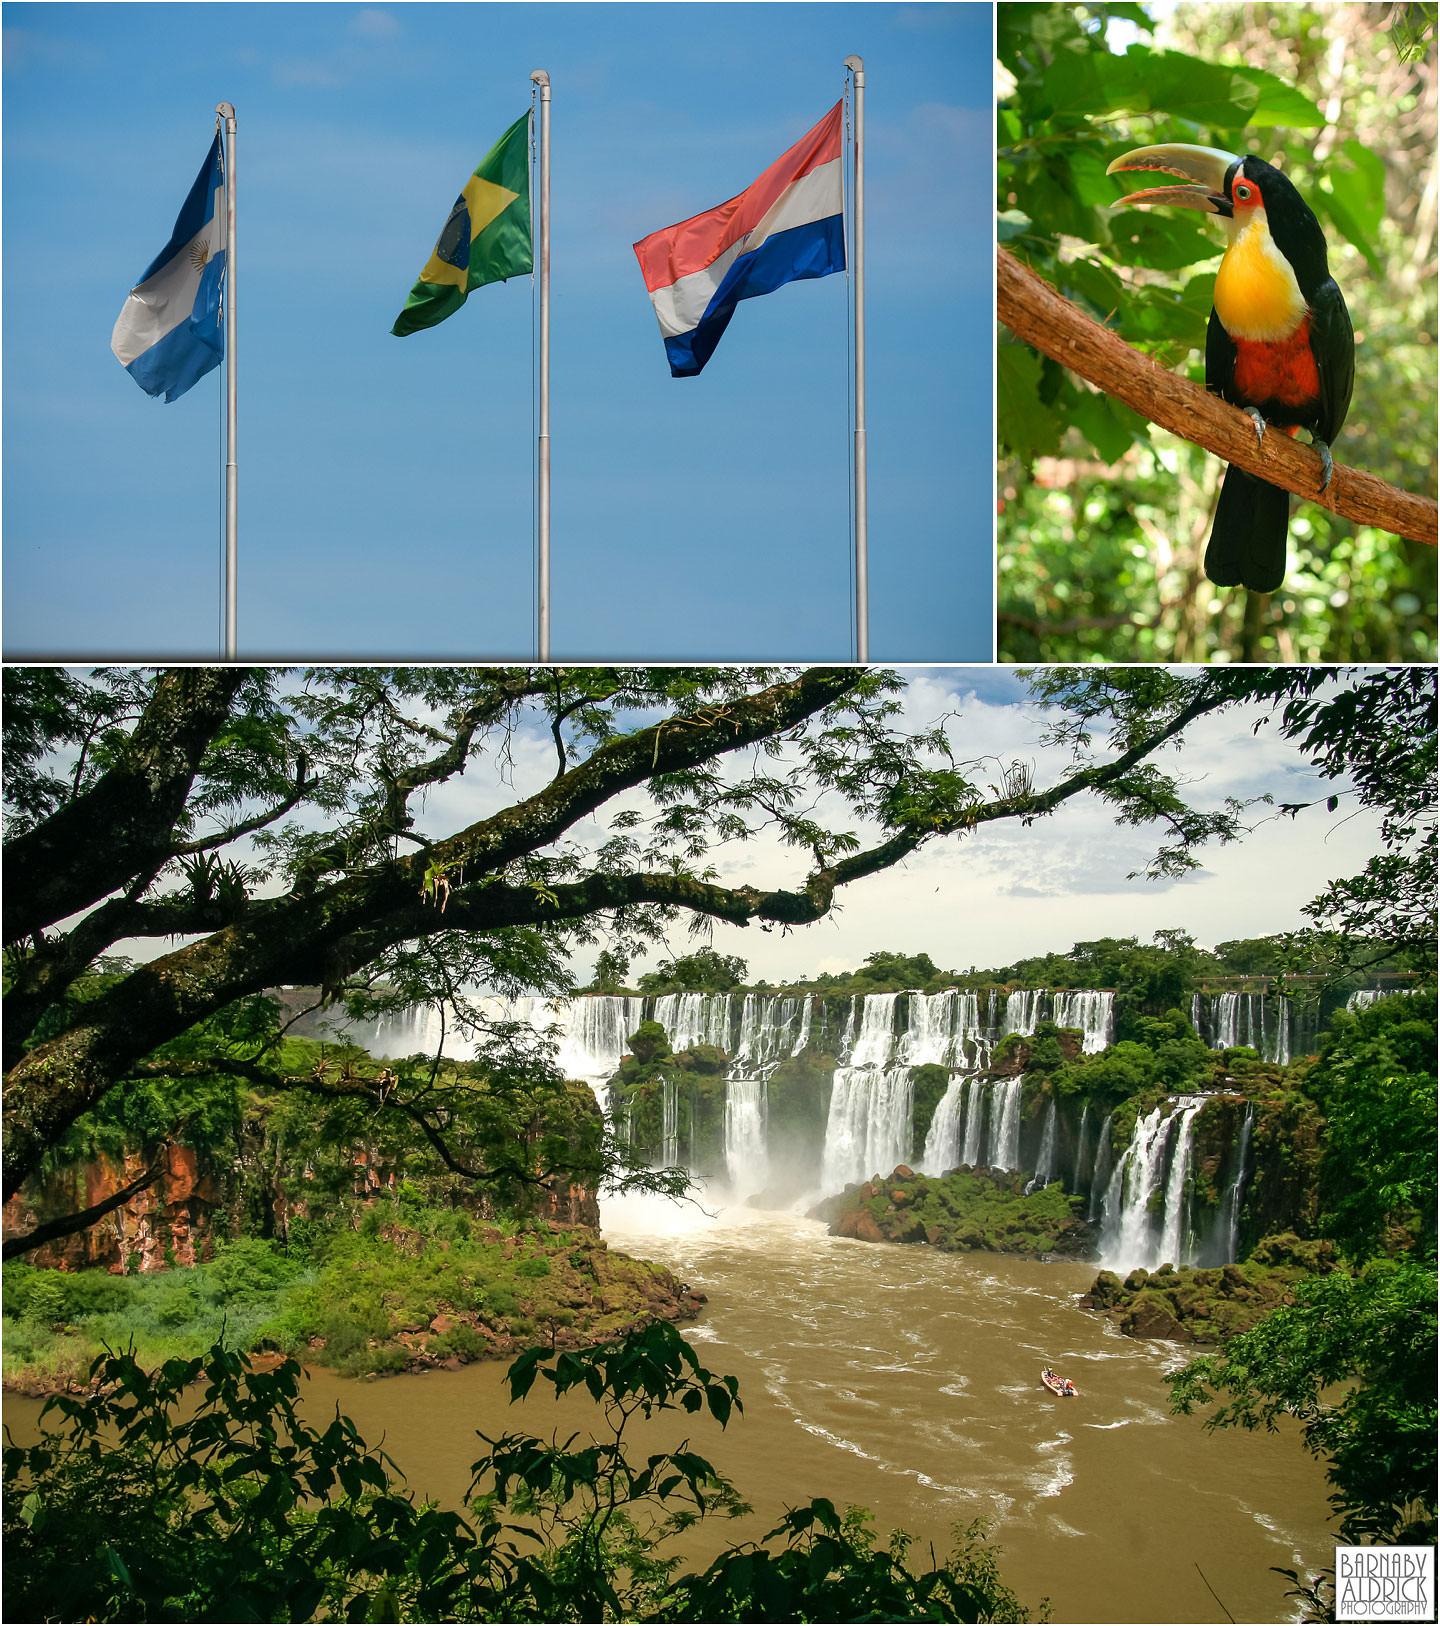 Iguaçu Falls Argentina side, iguazu falls Brazil, Iguaçu Falls Brazil Side